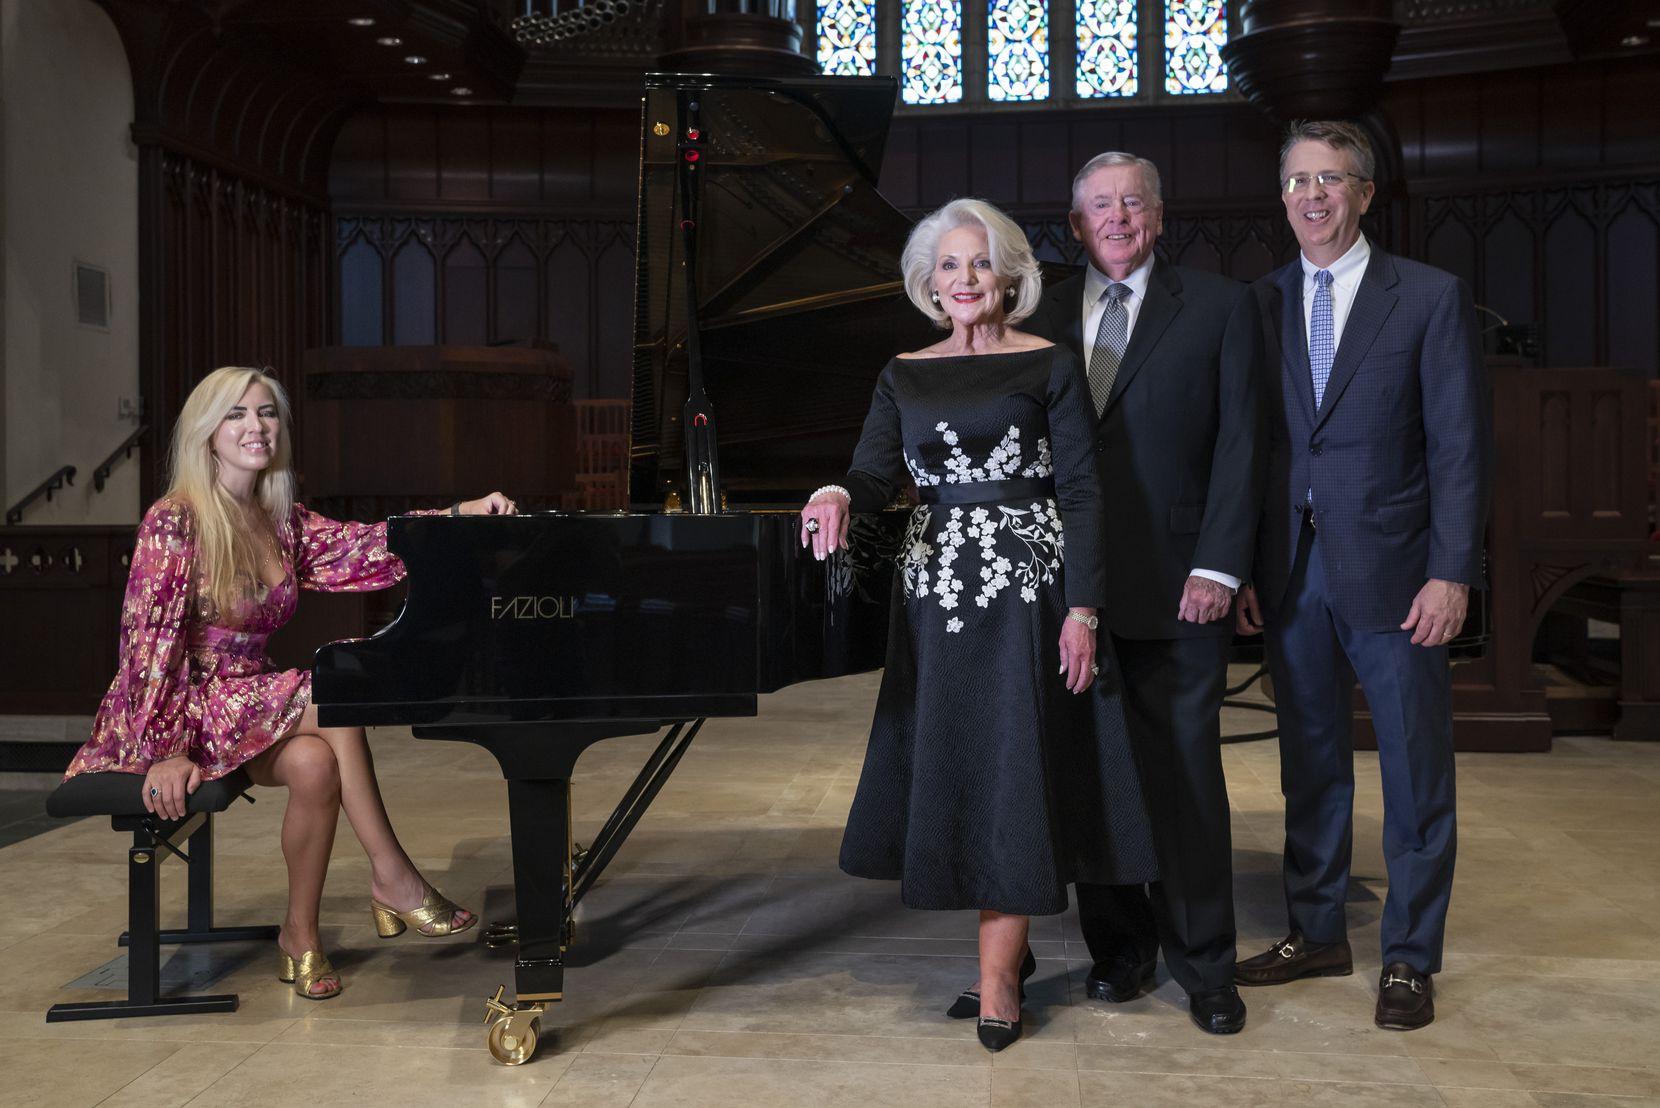 From left: Pianist Natasha Paremski, Dianne Adleta, Jack Adleta and the Rev. Paul Rasmussen are shown with the Fazioli piano.